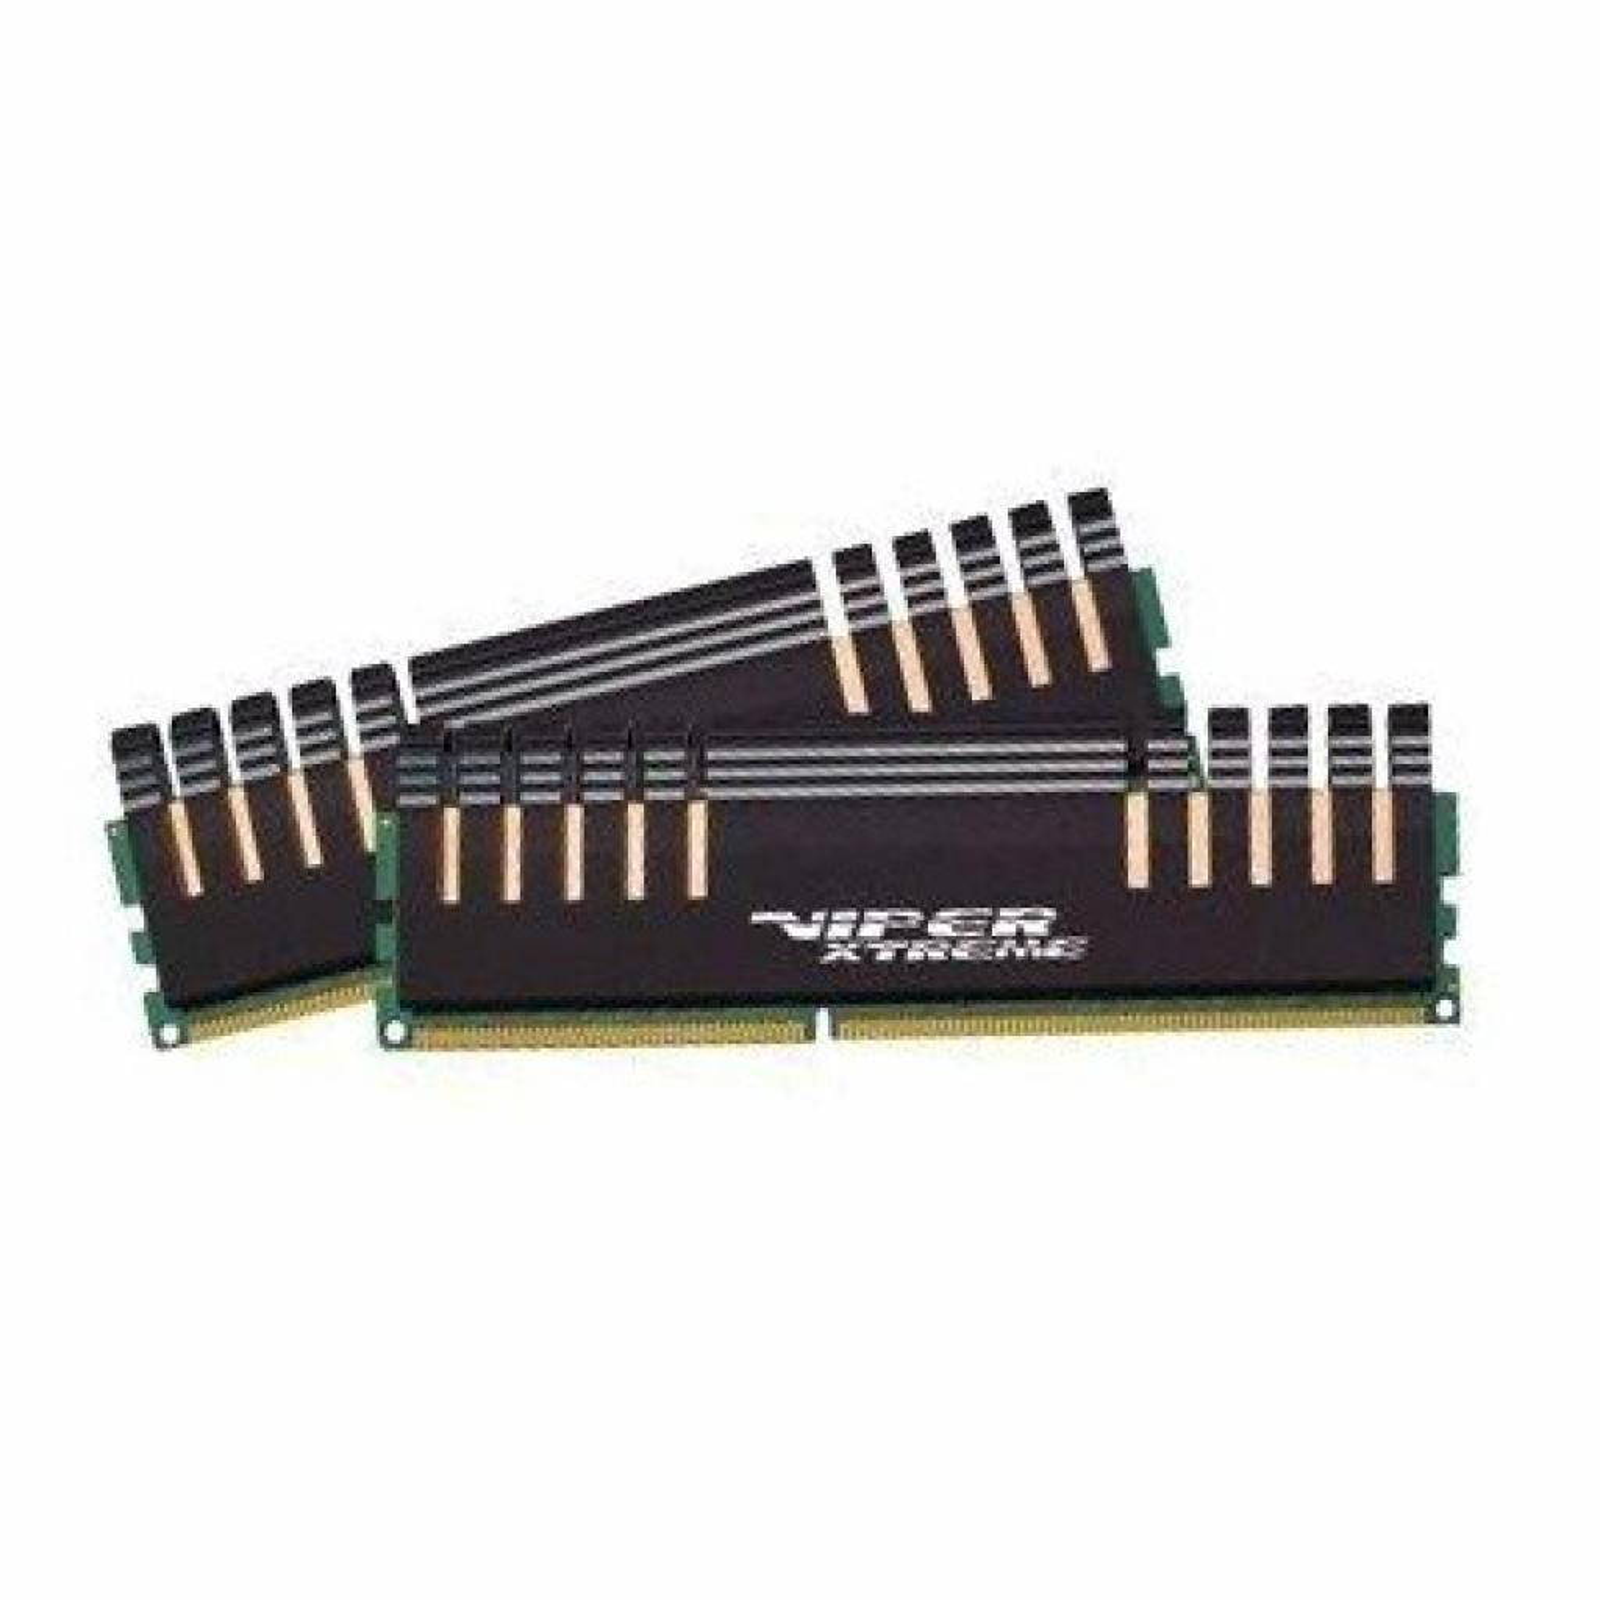 Модуль памяти для компьютера DDR3 8GB (2x4GB) 1600 MHz Patriot (PXD38G1600ELK)